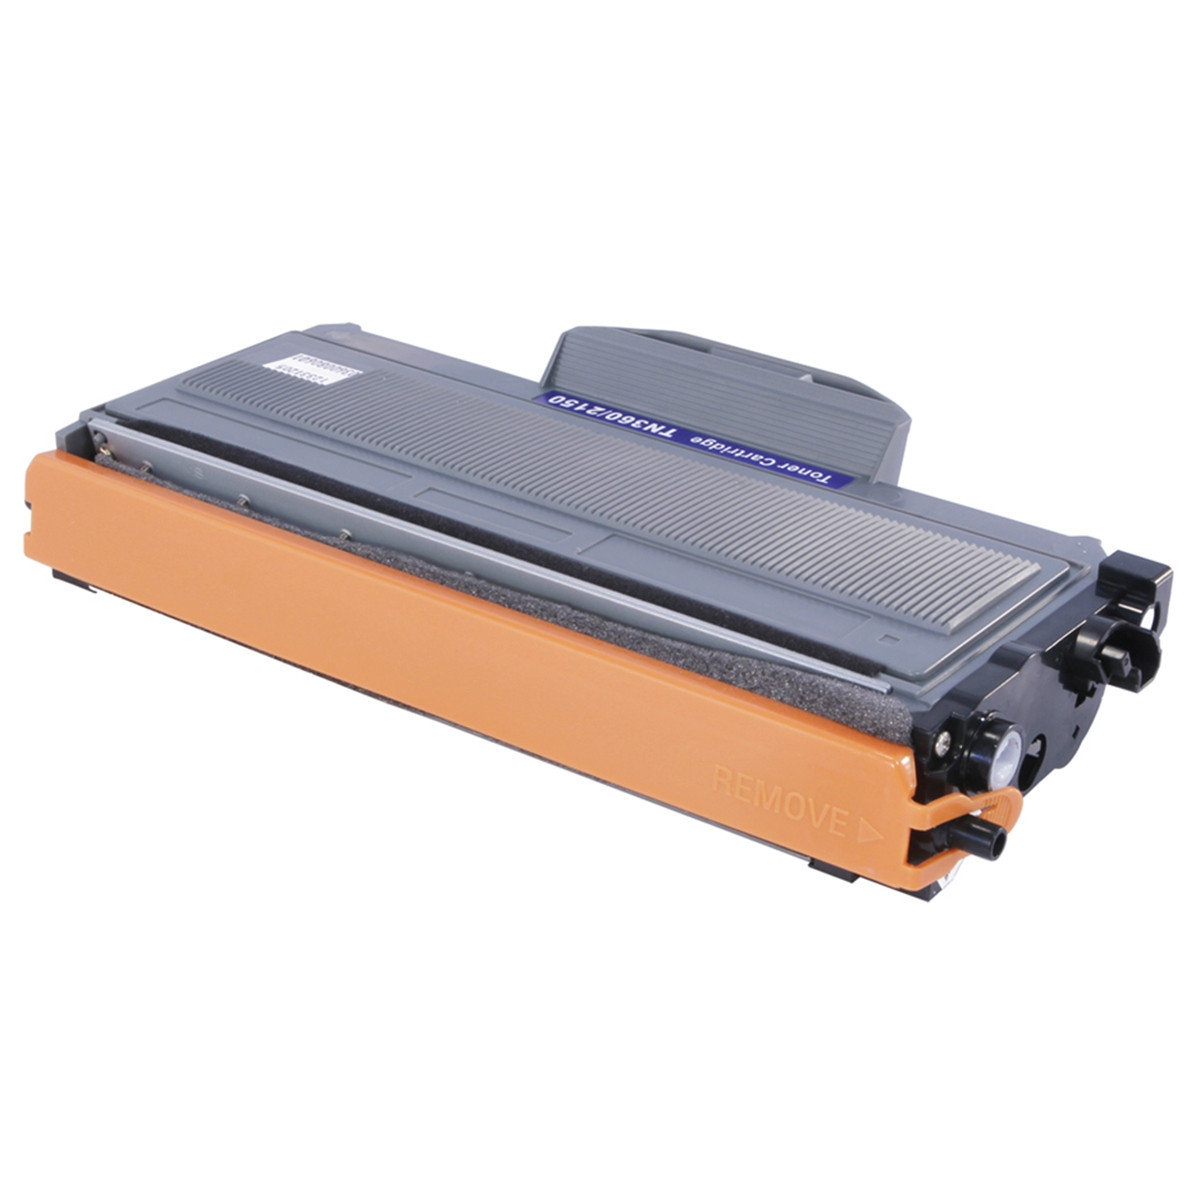 Toner Compatível com Brother TN330 | DCP7070 HL2140 HL2170W MFC7440W MFC7840W | Premium 2.6k